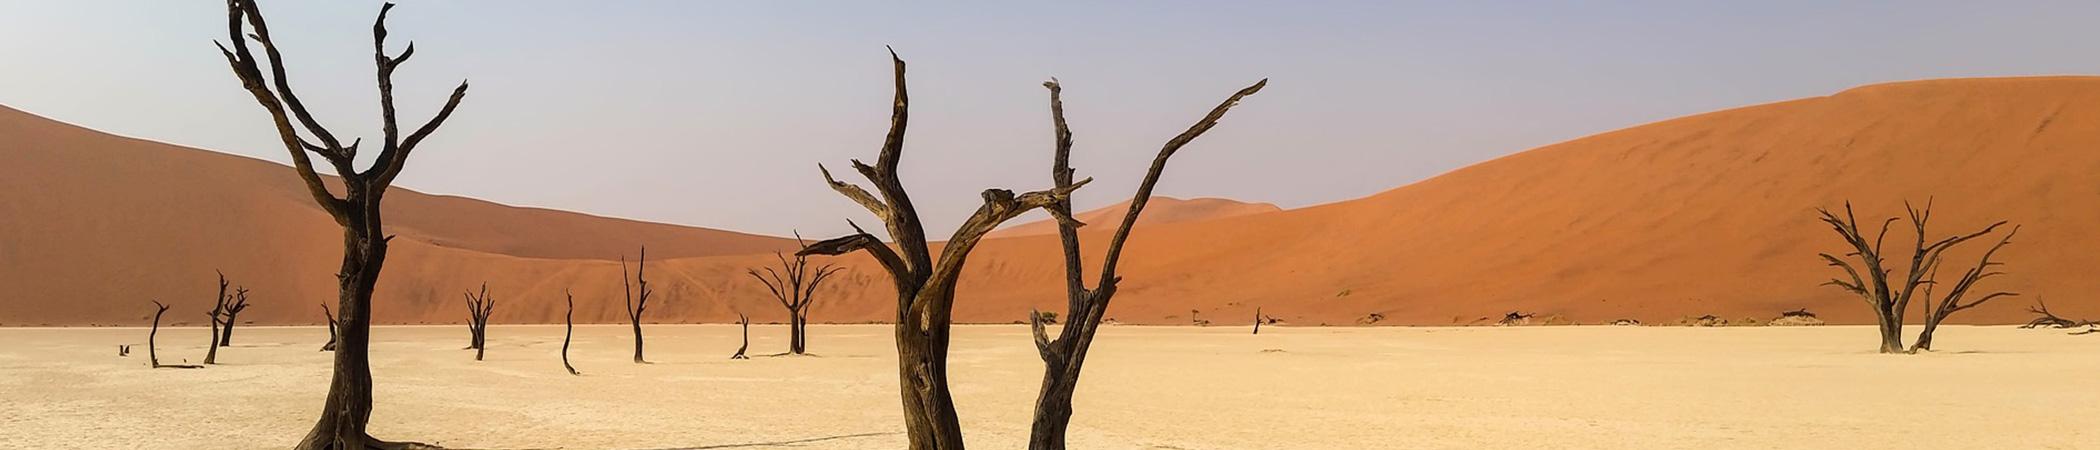 Namibia Holiday Destination